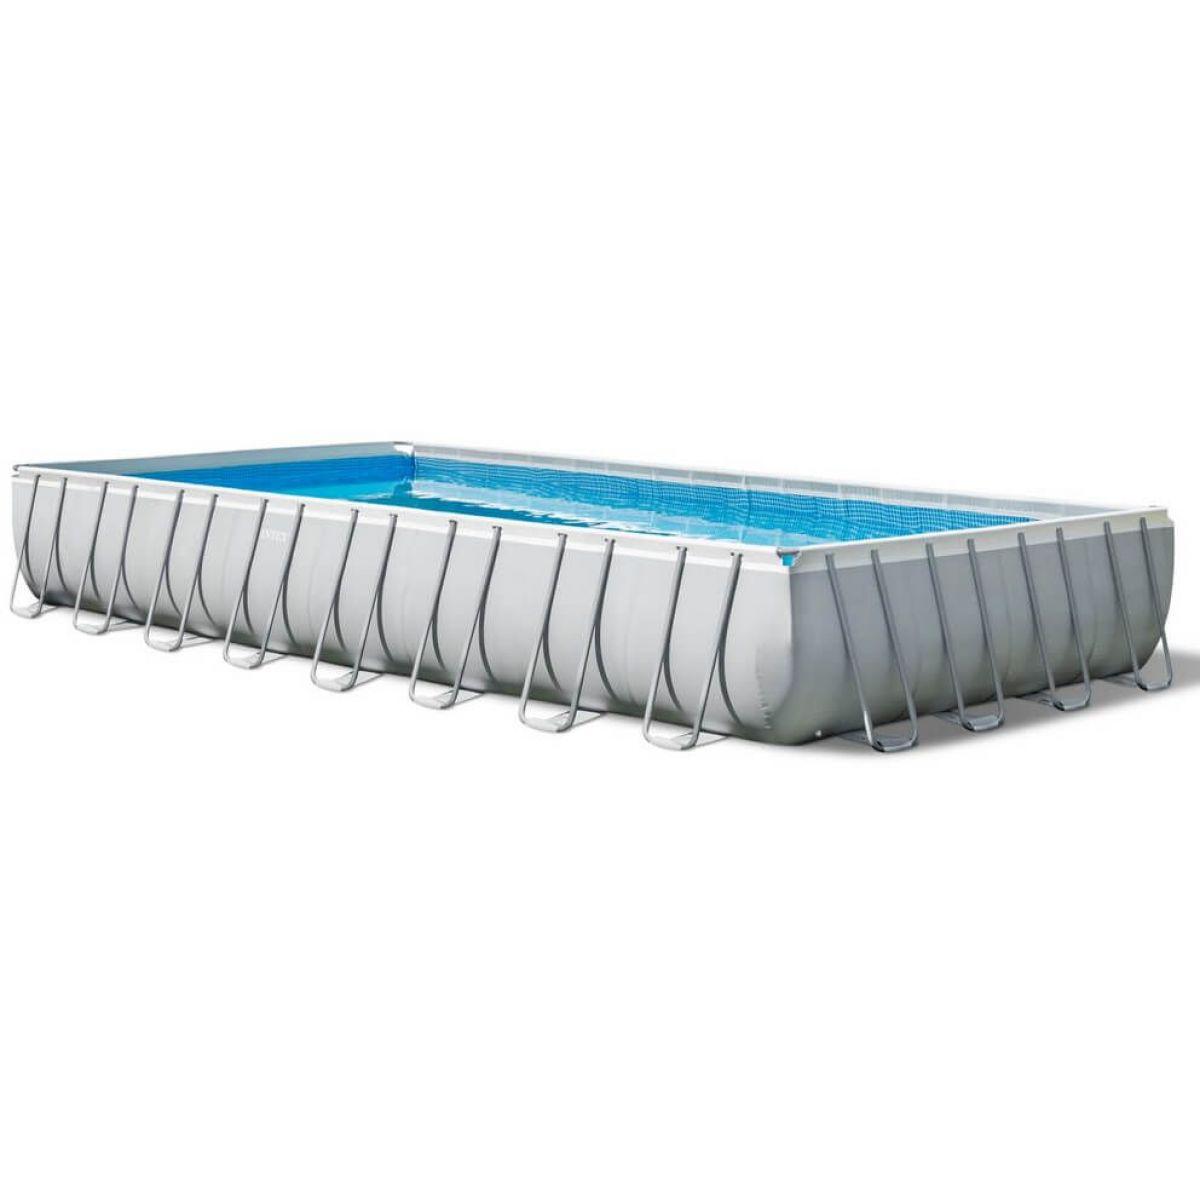 Intex 28372NP Obdélníkový bazén Ultra Frame Pool 975 x 488 x 132 cm